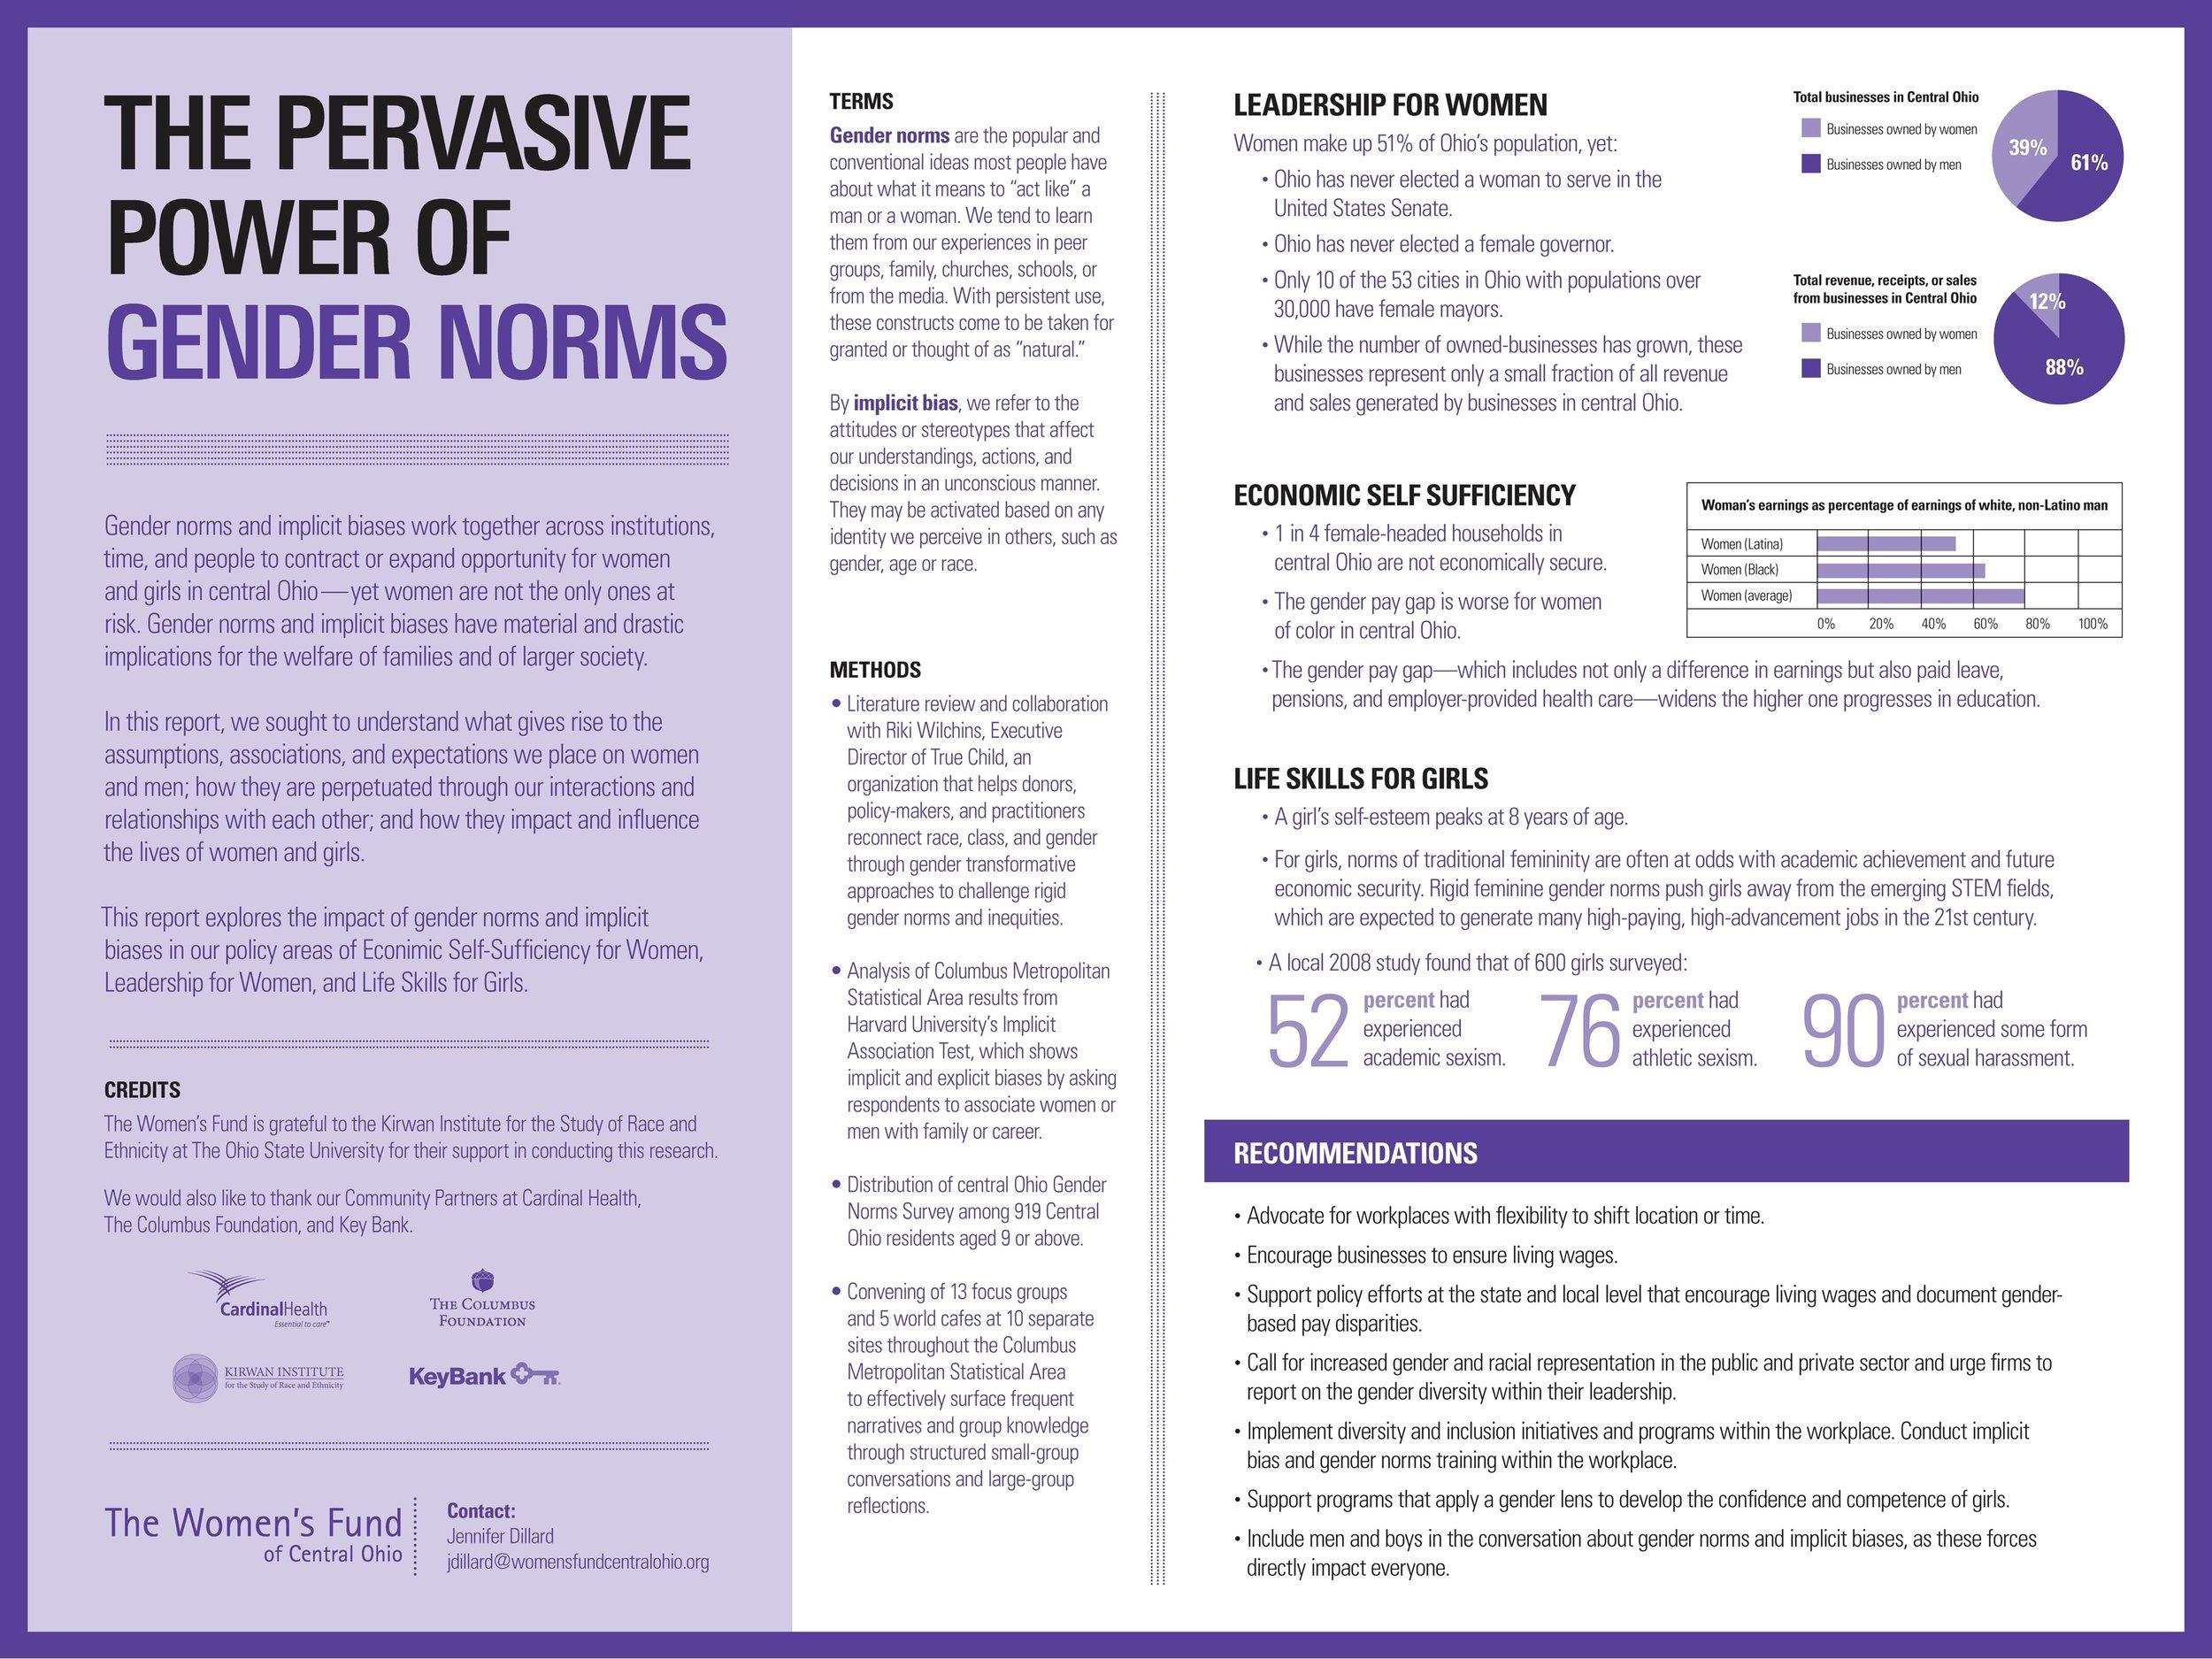 160816 WFCO Pervasive Power of Gender Norms Poster (Final).jpg